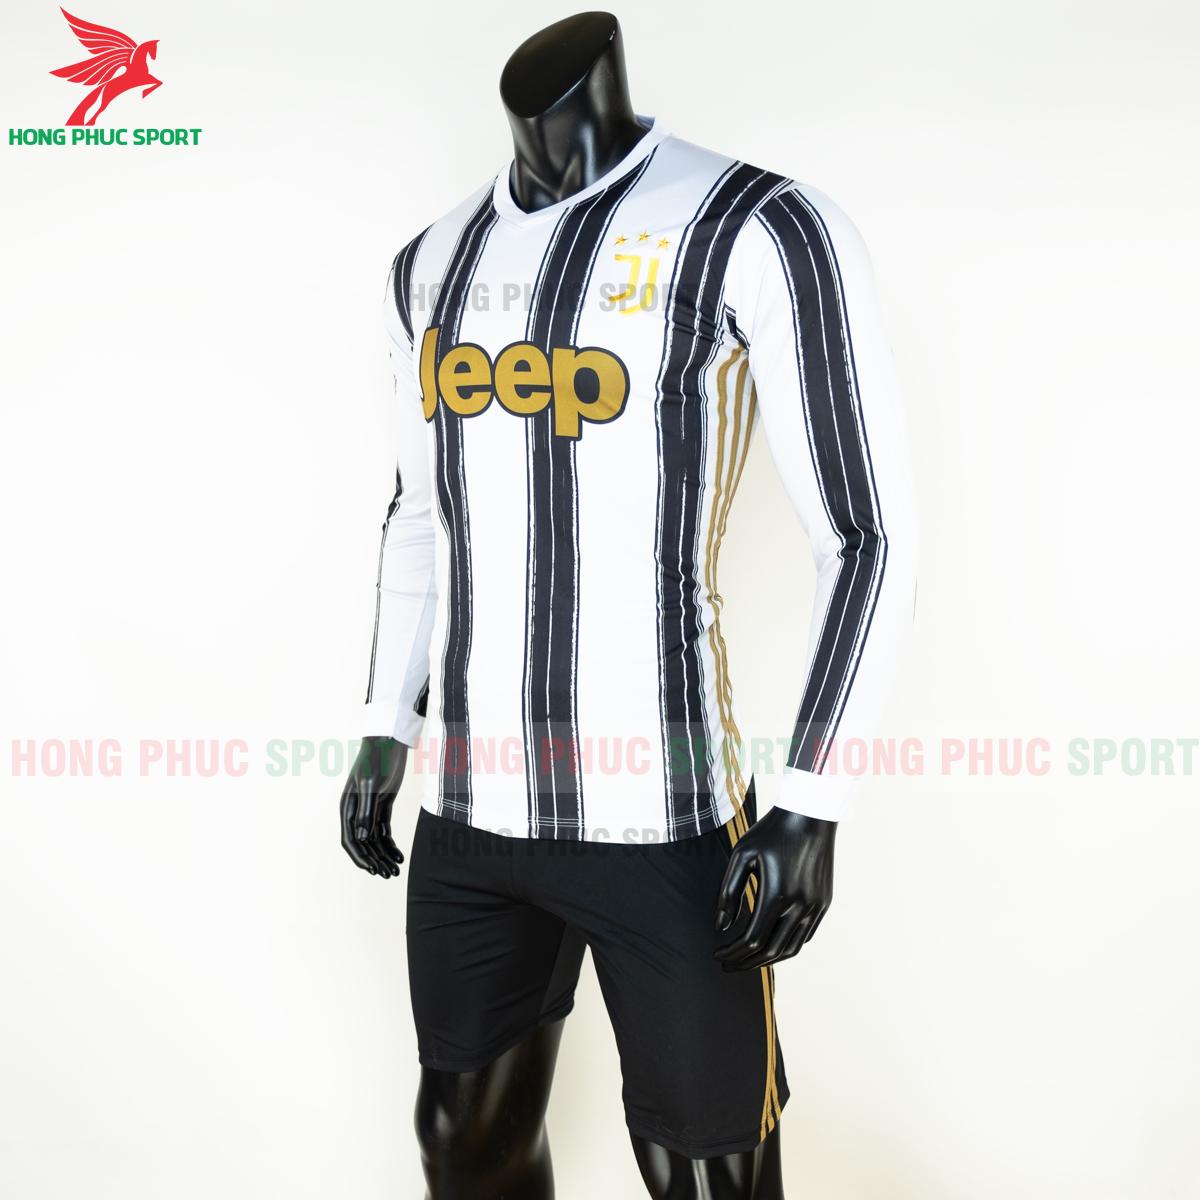 https://cdn.hongphucsport.com/unsafe/s4.shopbay.vn/files/285/ao-dai-tay-juventus-2020-san-nha-4-5f8fbdde1158b.png